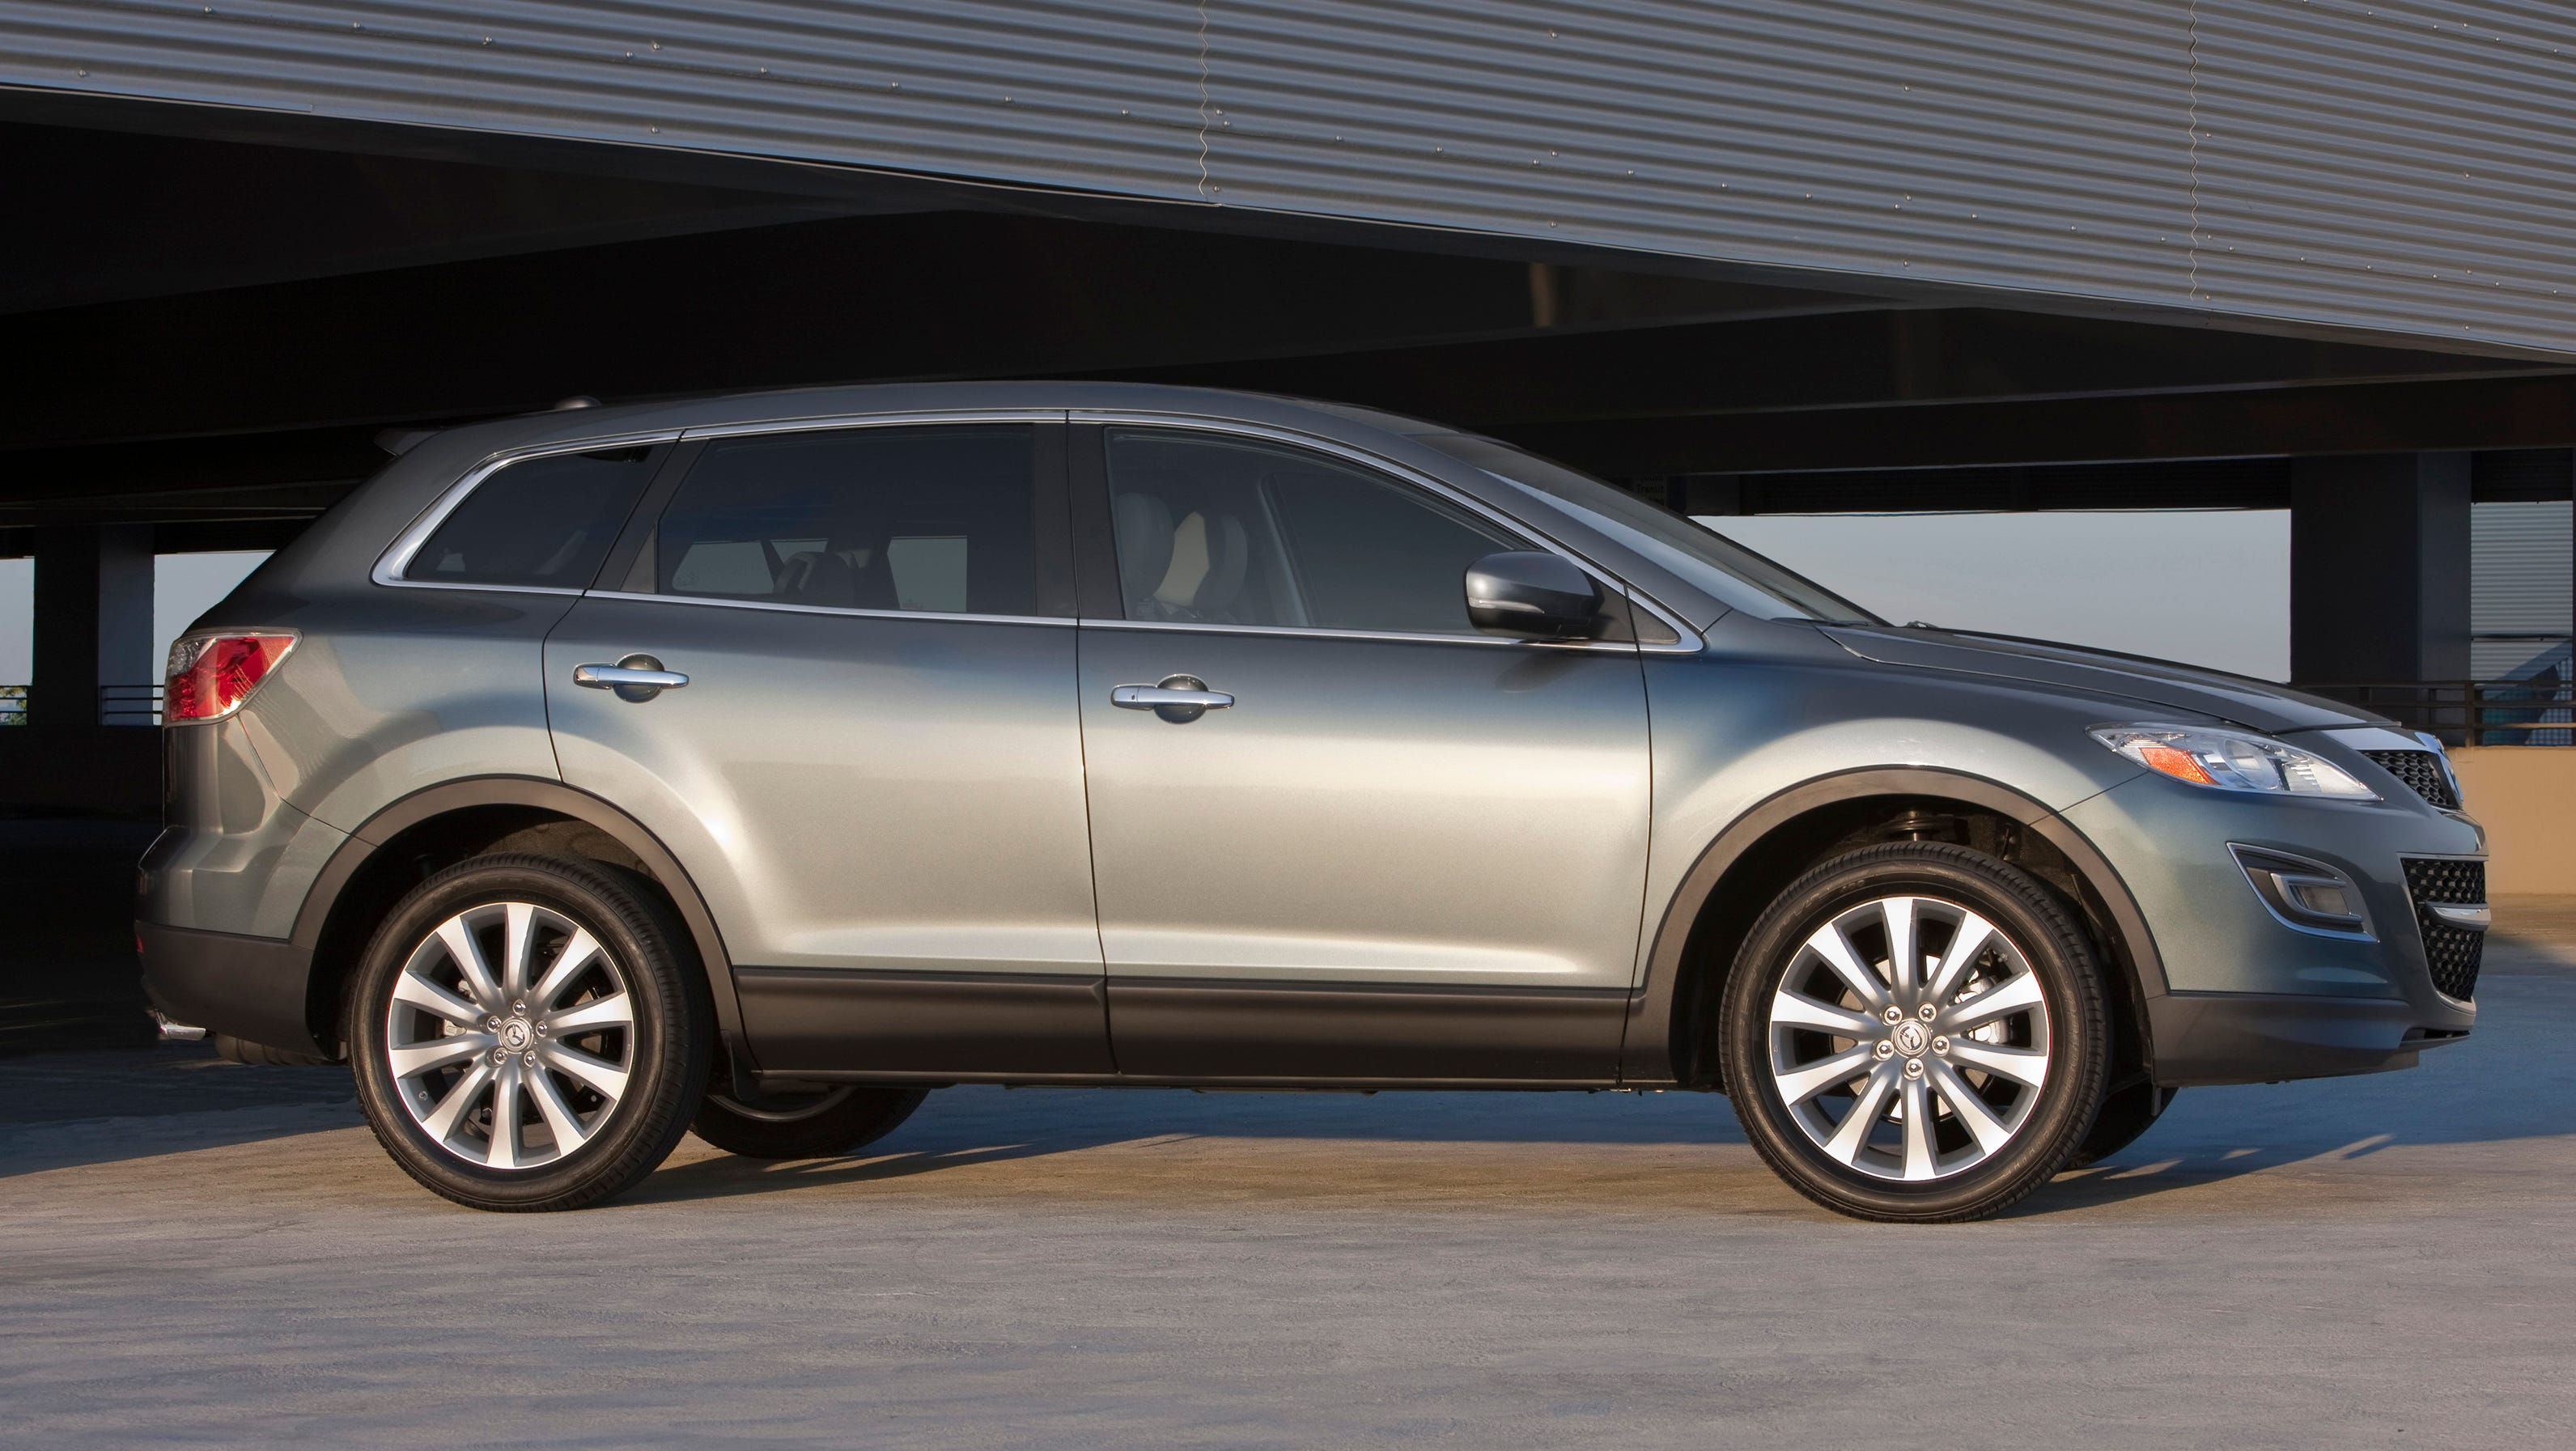 Kekurangan Mazda Cx 9 2011 Spesifikasi